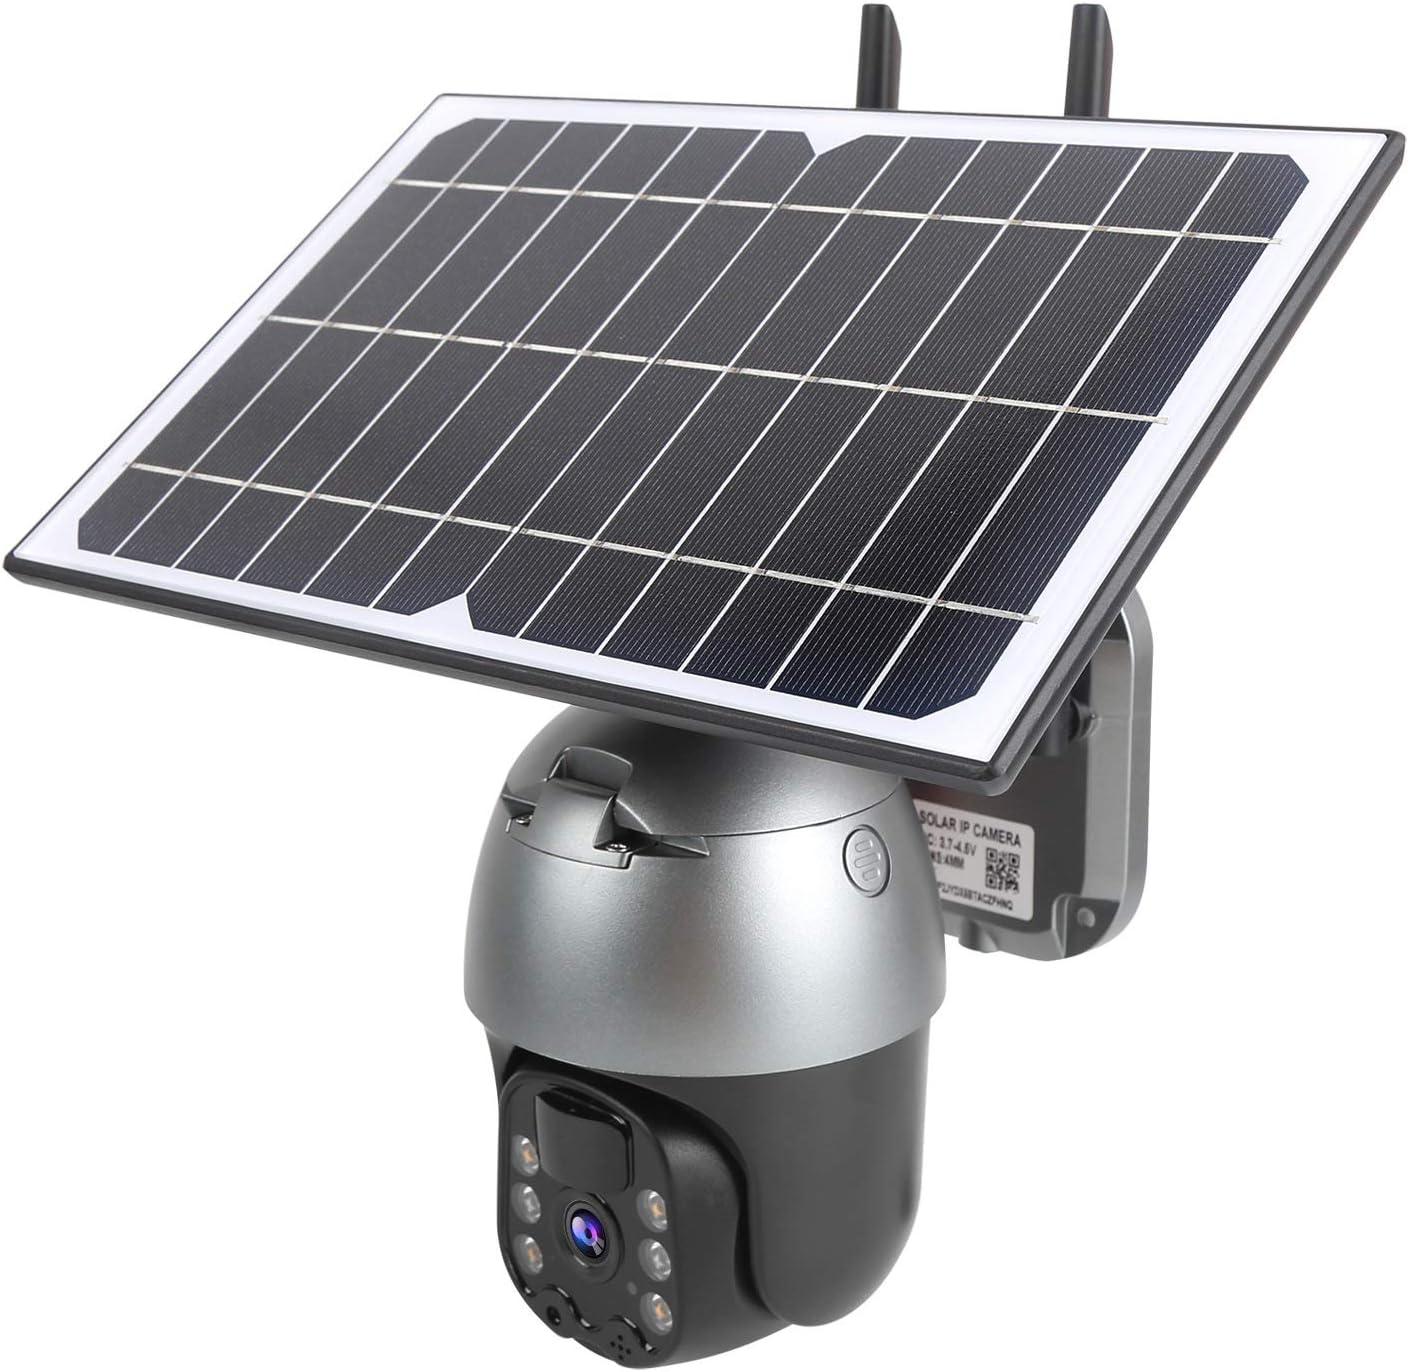 Direct sale of Long-awaited manufacturer FOLOSAFENAR 1080P Solar Outdoor Wireless Security W Camera